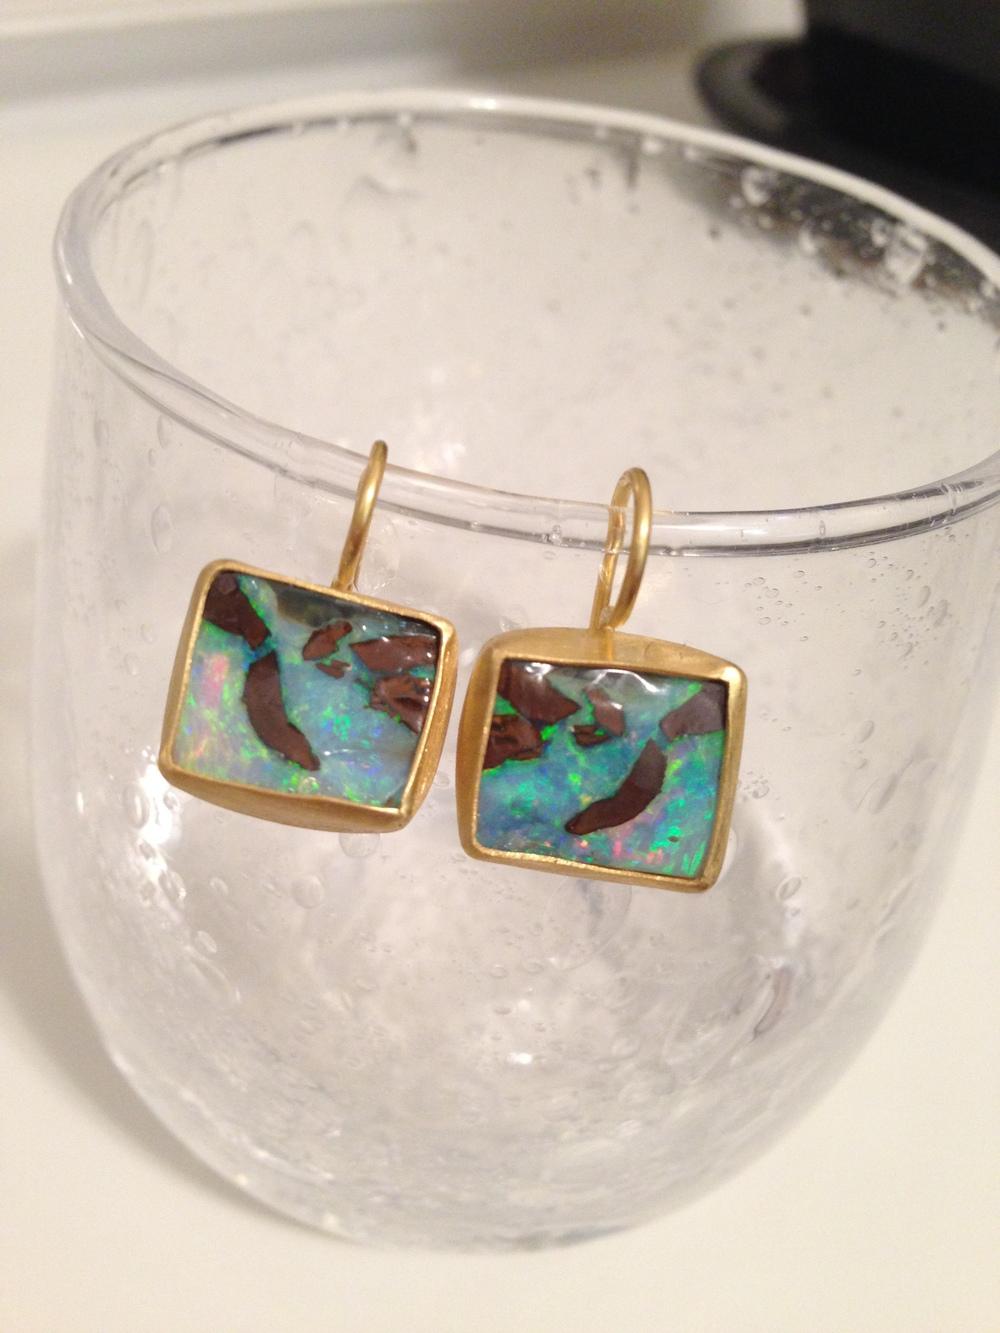 boulder opal cocktail earrings.jpg